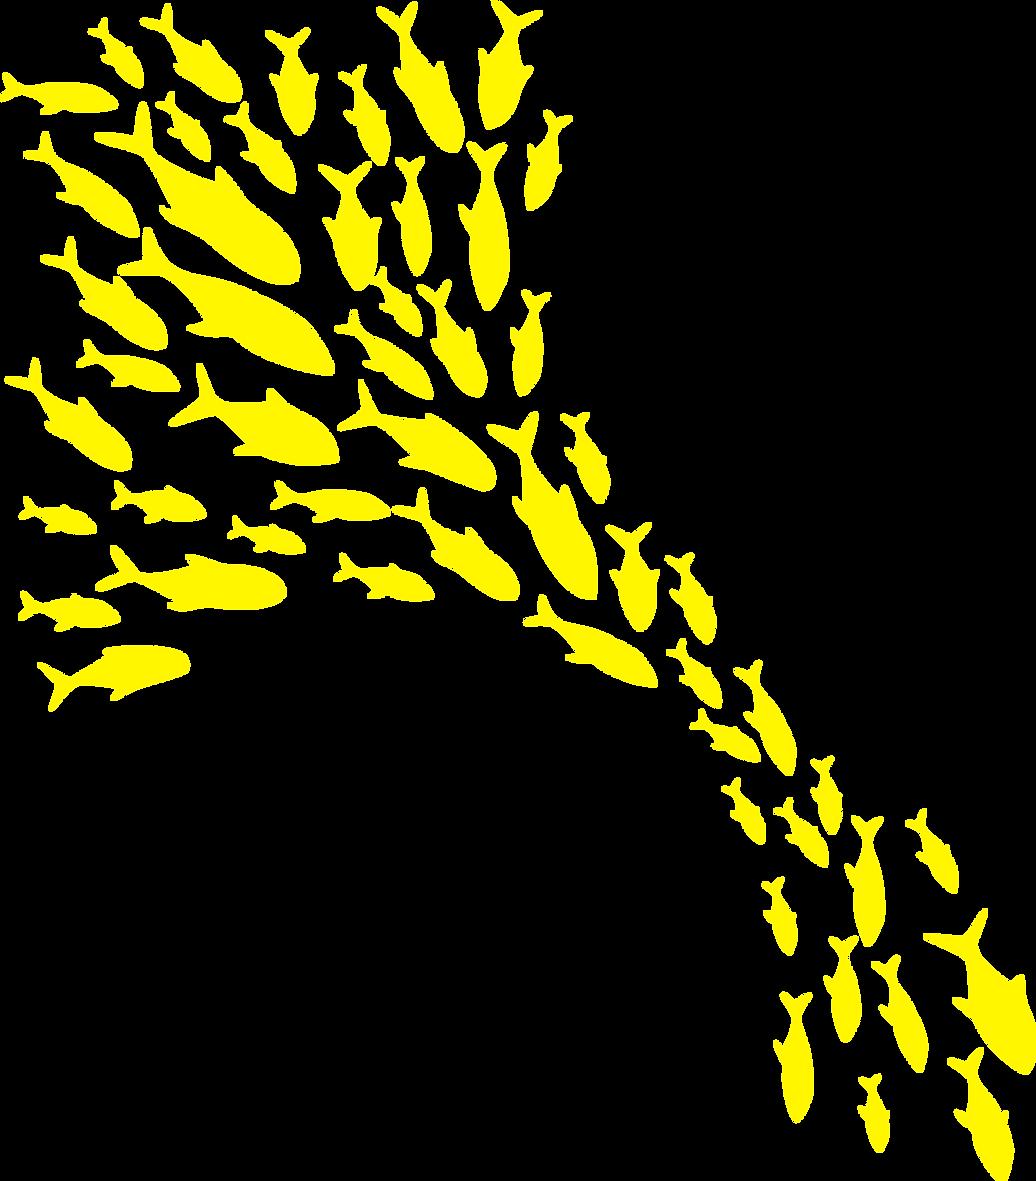 School of Fish - Yellow